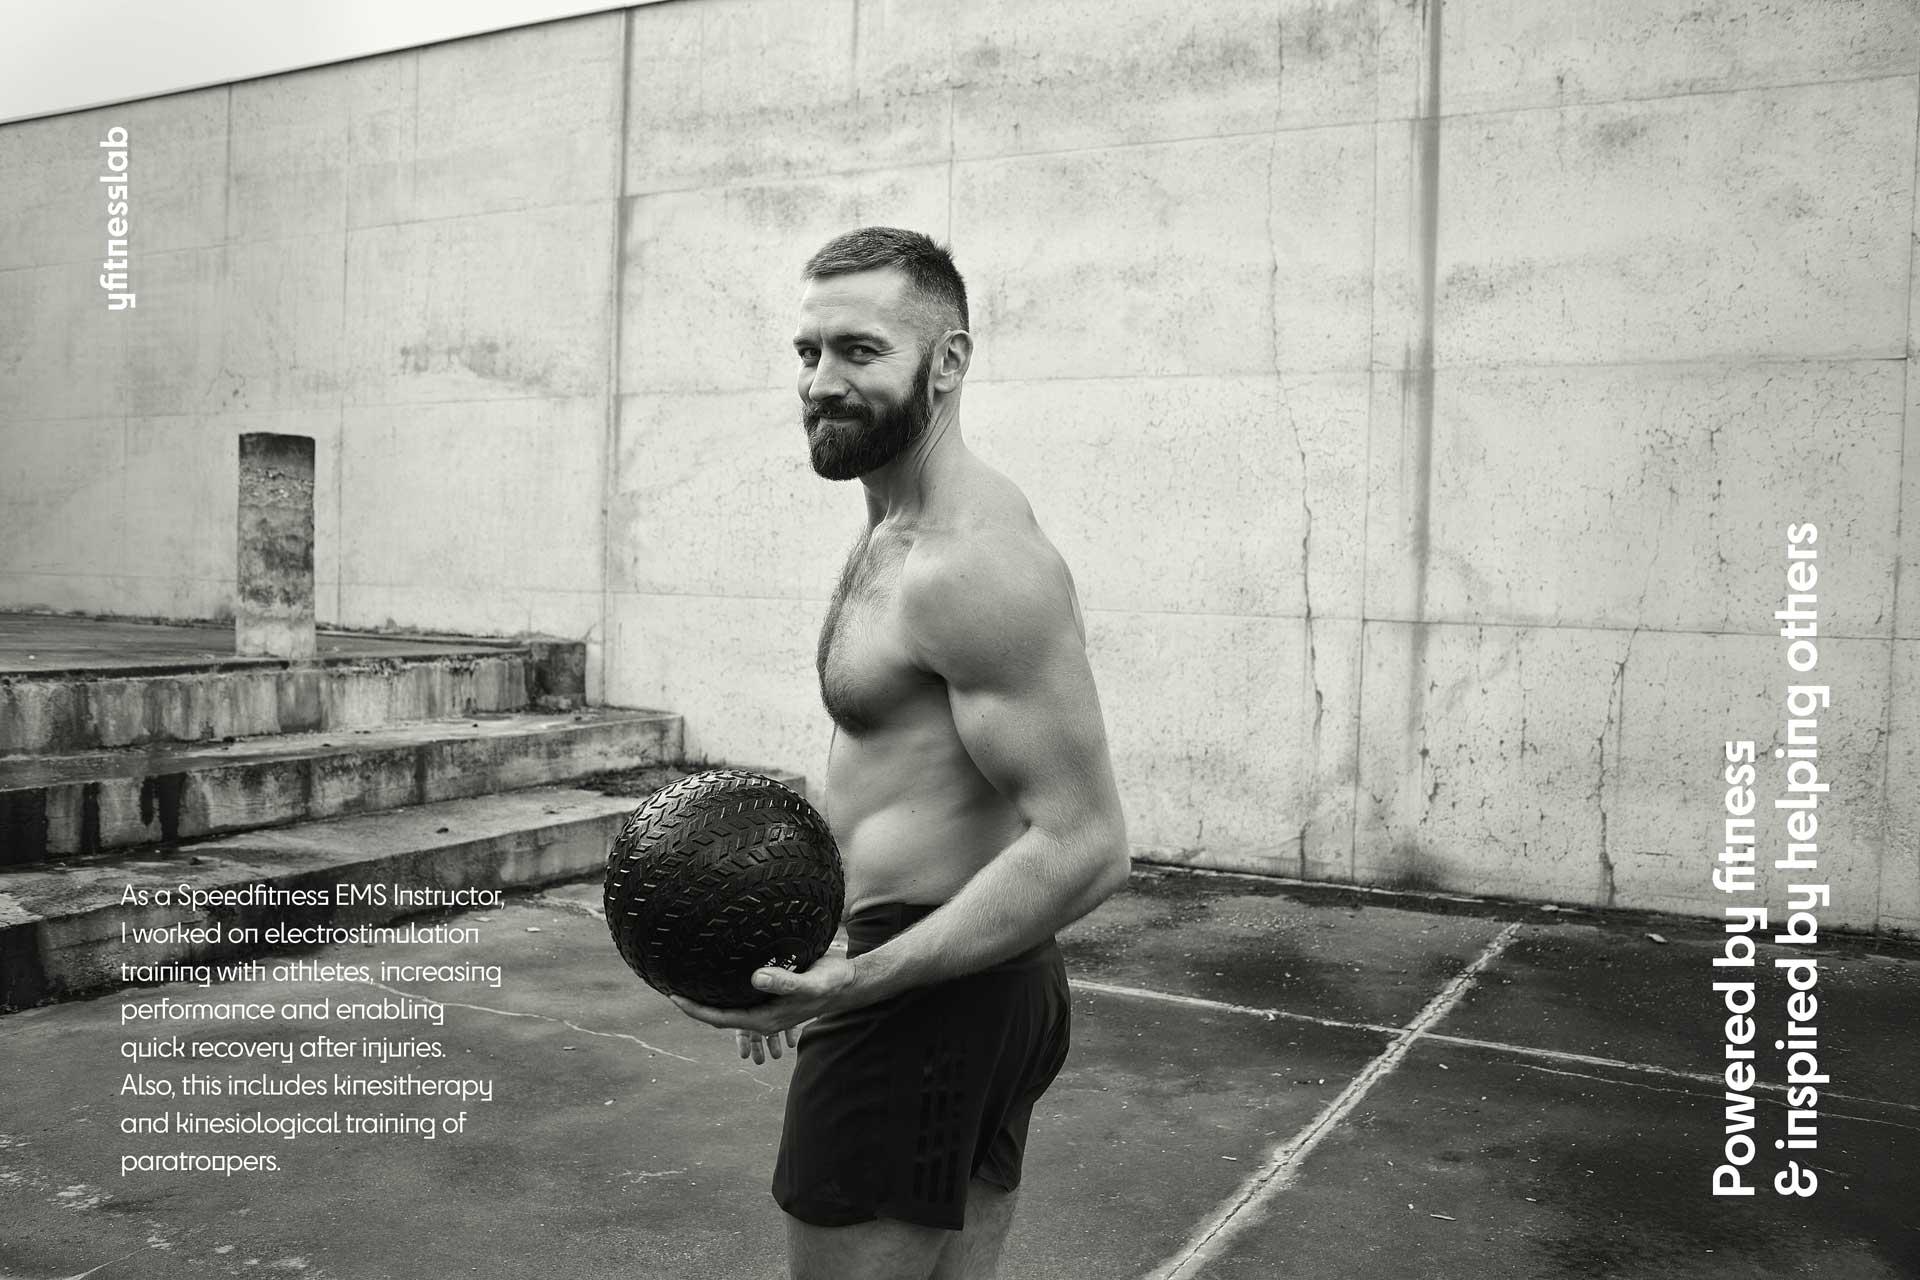 yfitnesslab deyan cvetkovic fitness trainer ems speedfitness instructor general condition studio logo